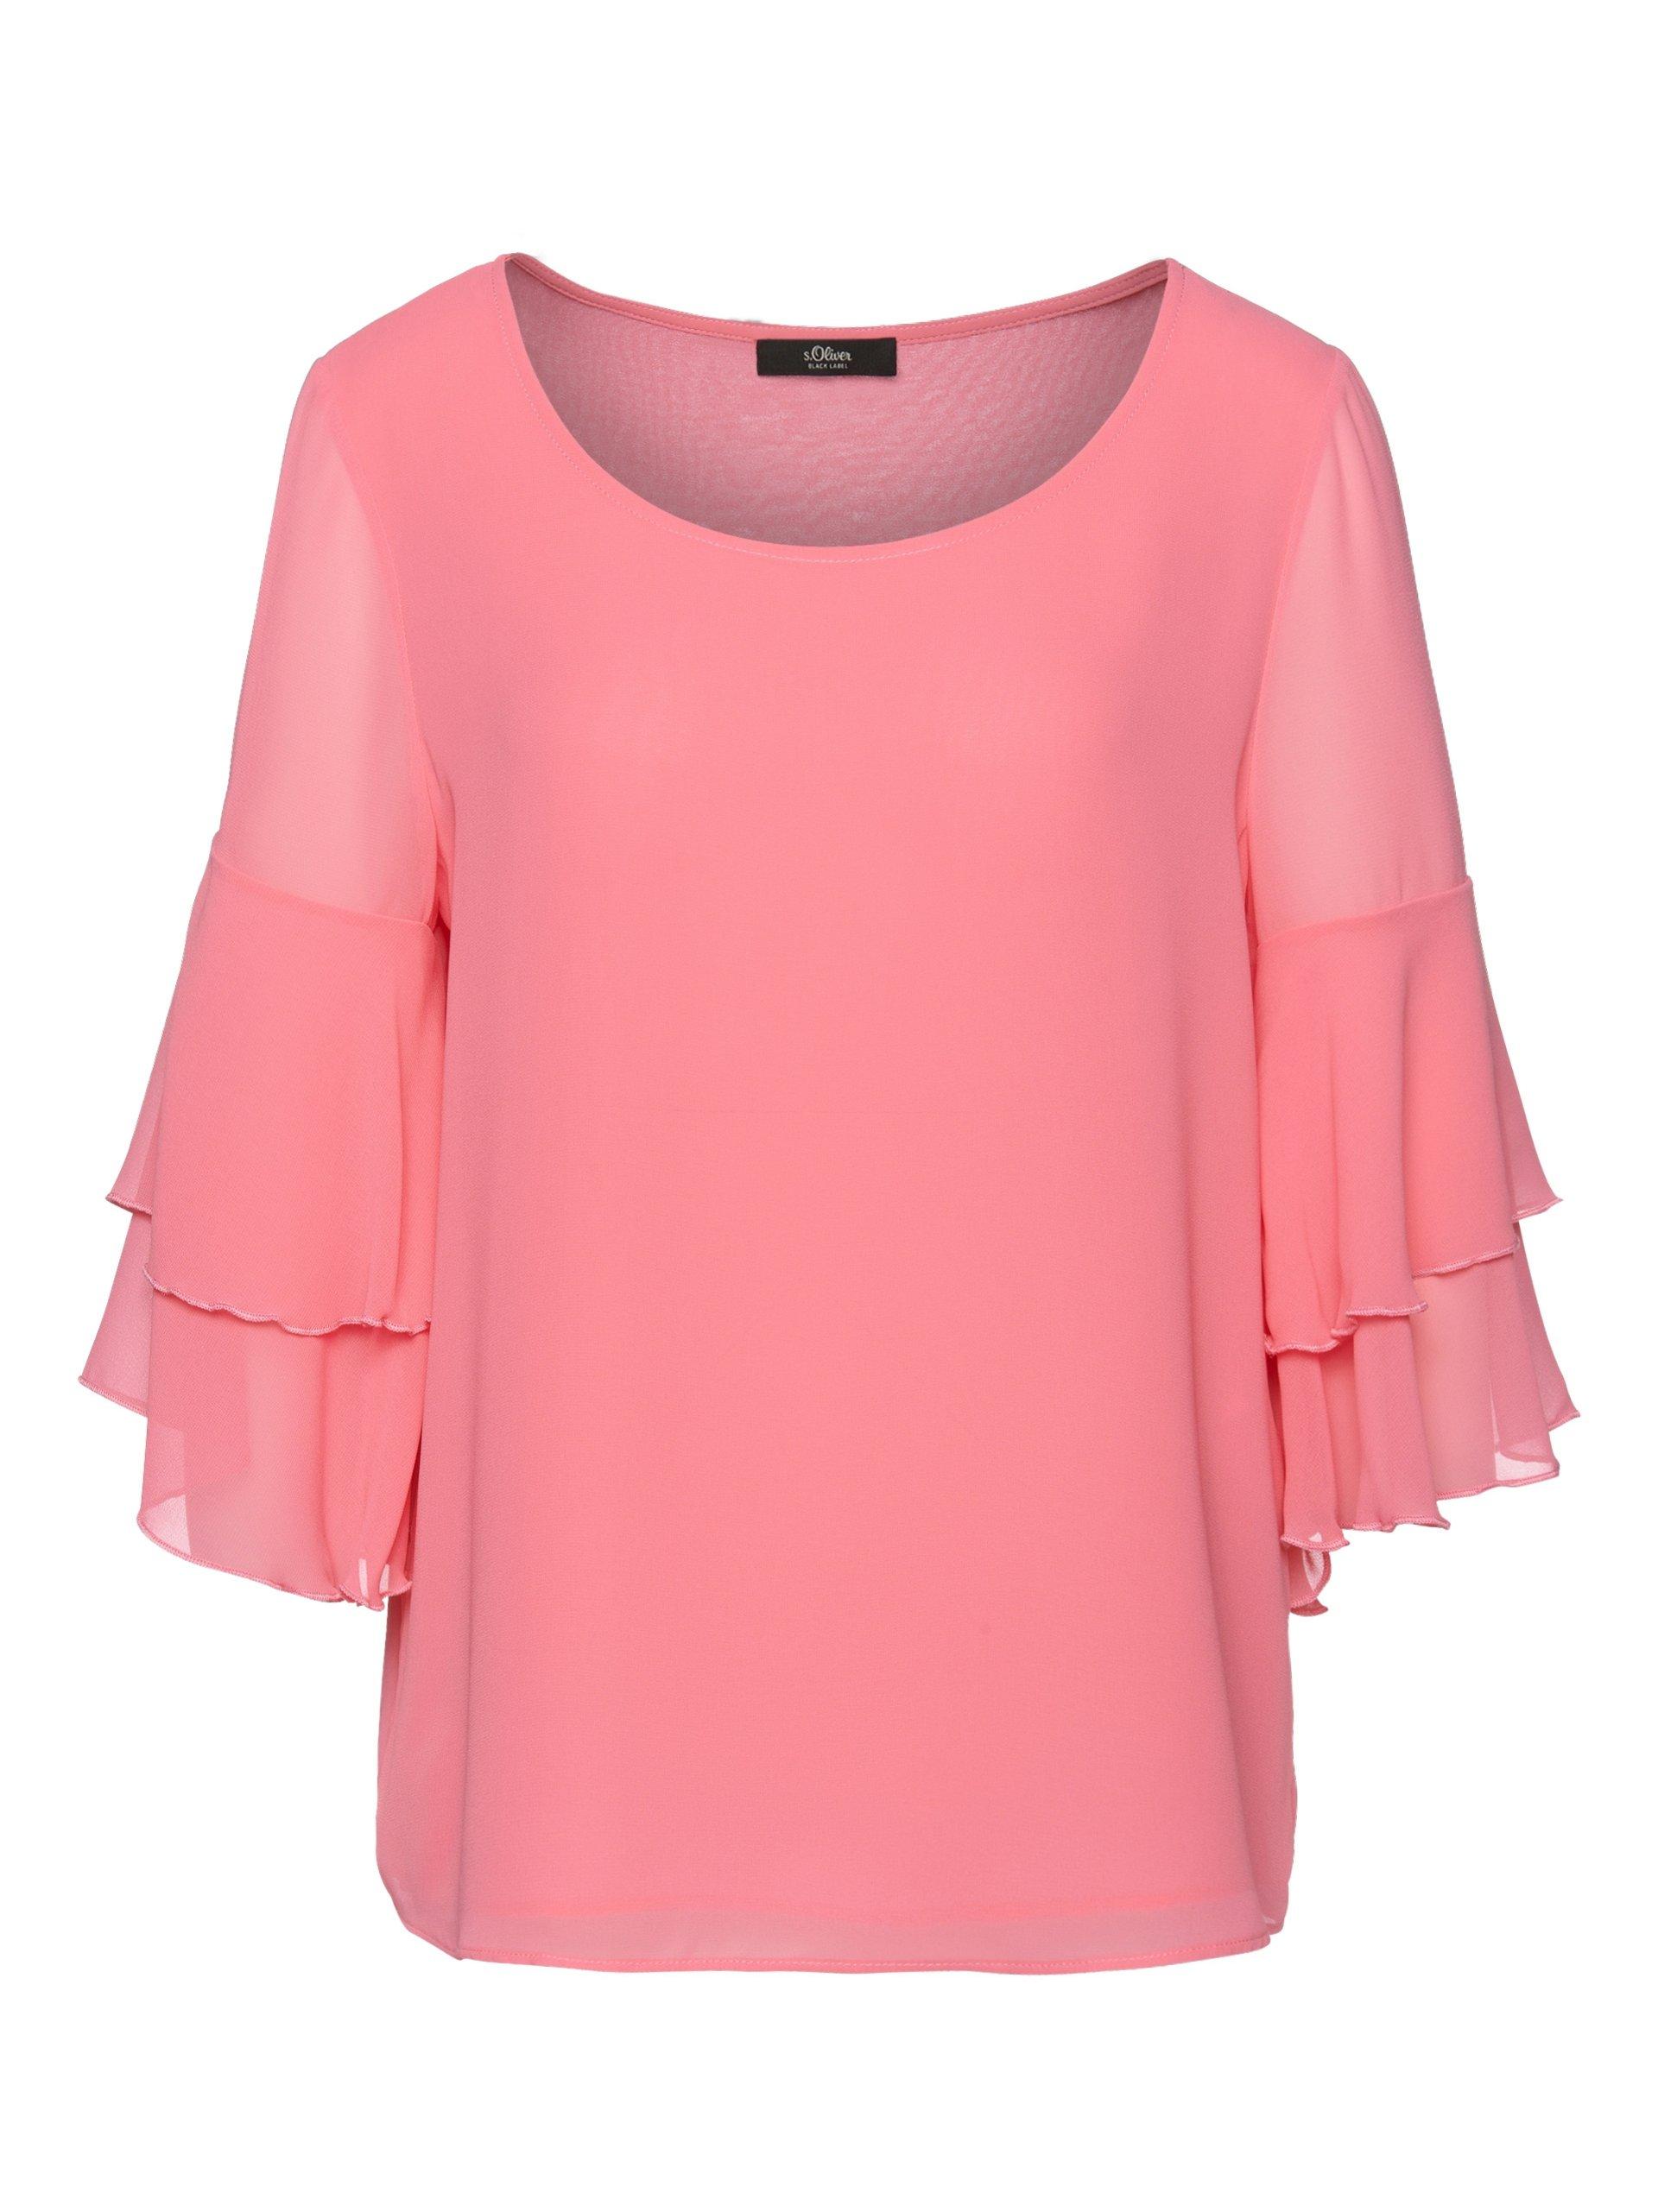 s oliver black label damen bluse rosa uni online kaufen peek und cloppenburg de. Black Bedroom Furniture Sets. Home Design Ideas